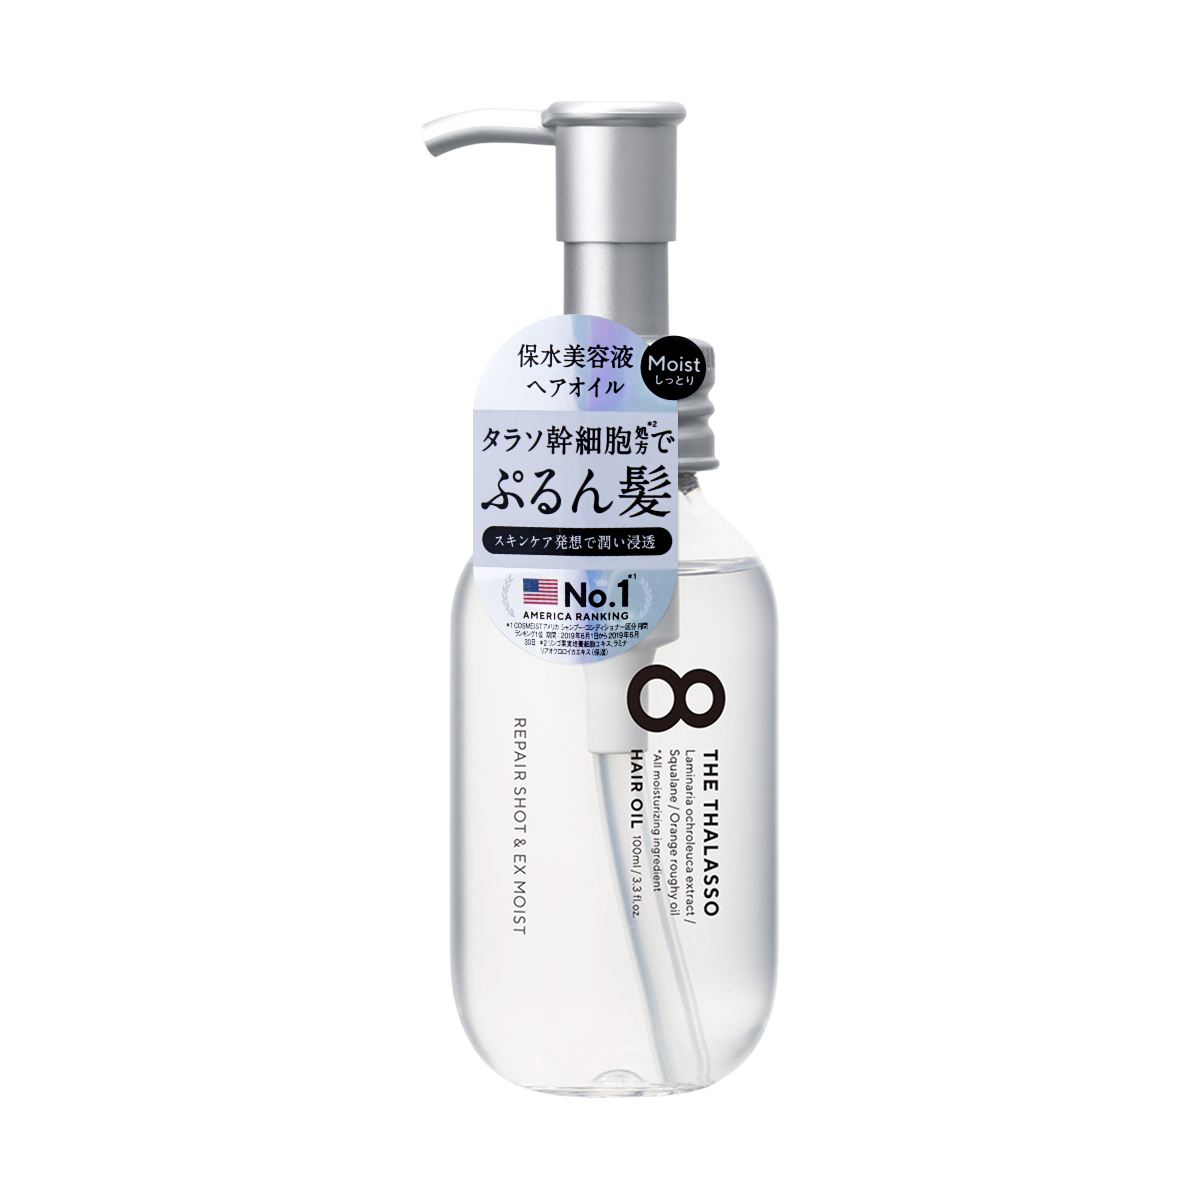 Yamibuy.com:Customer reviews:8 THE THALASSO Hair Oil Moist 100ml